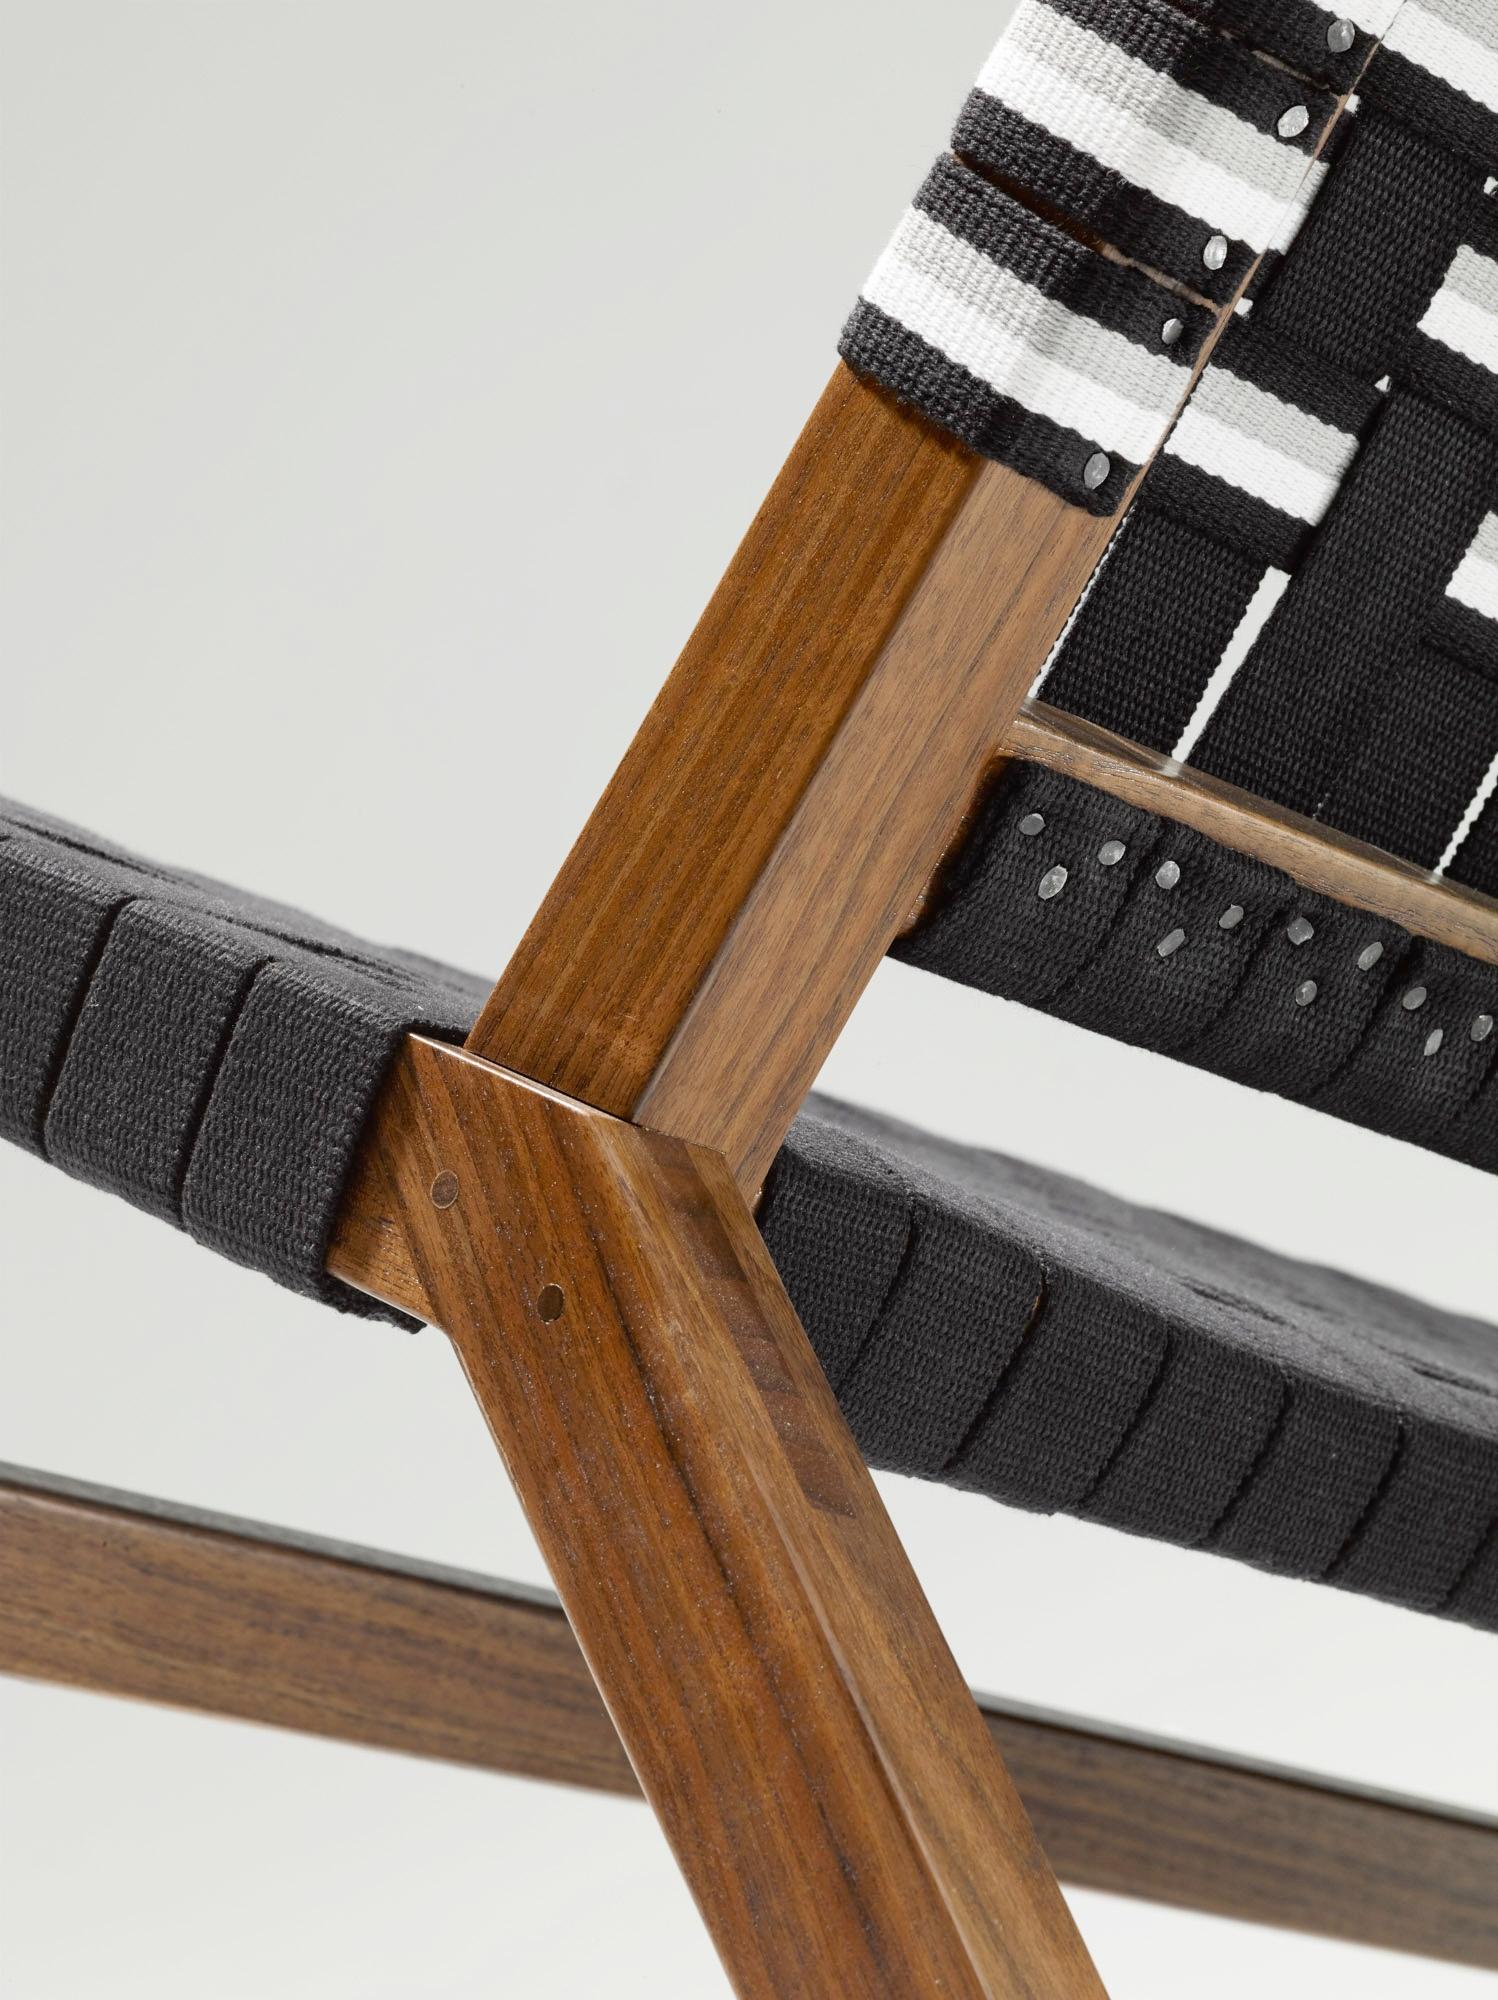 Wooden Bench Detail Shot Furniture Photography